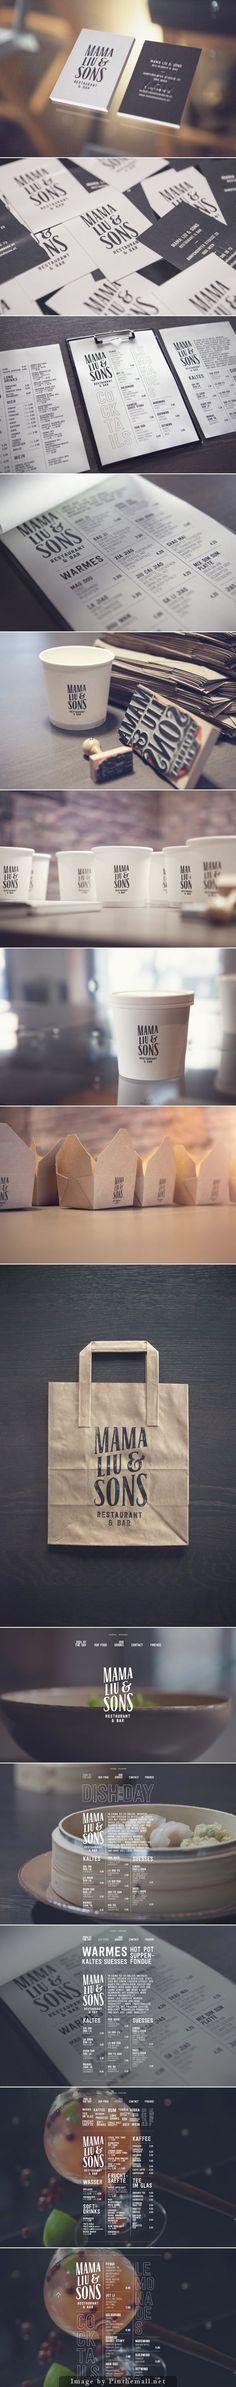 MAMA LIU & SONS  Branding corporate identity stationary packaging by atelier olschinsky